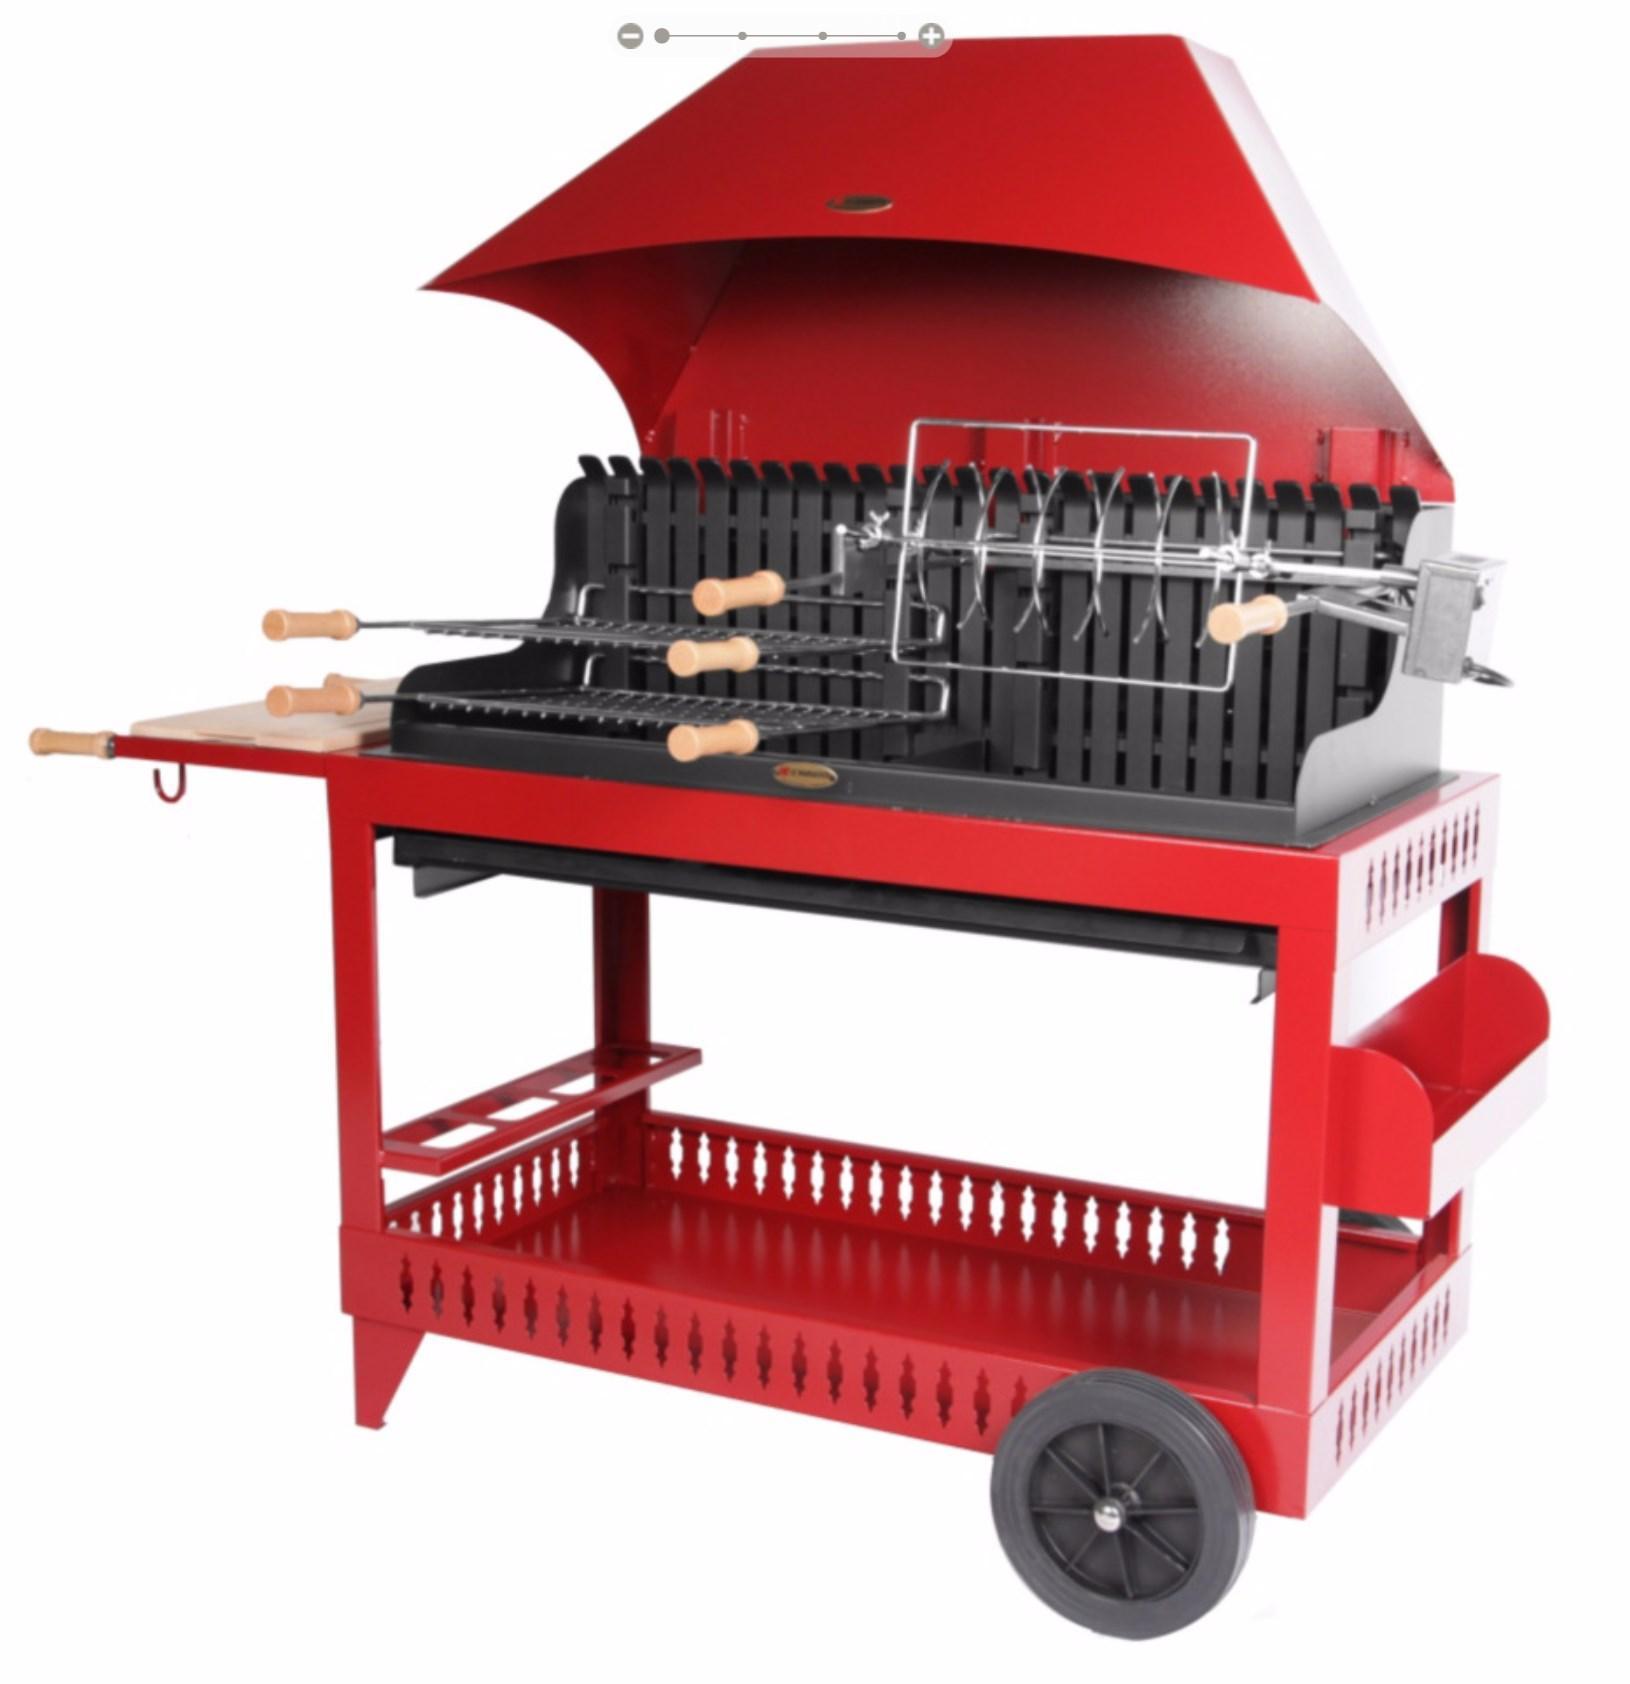 Barbecue Arthur Lemarquier - Double foyer, chariot et hotte incluse